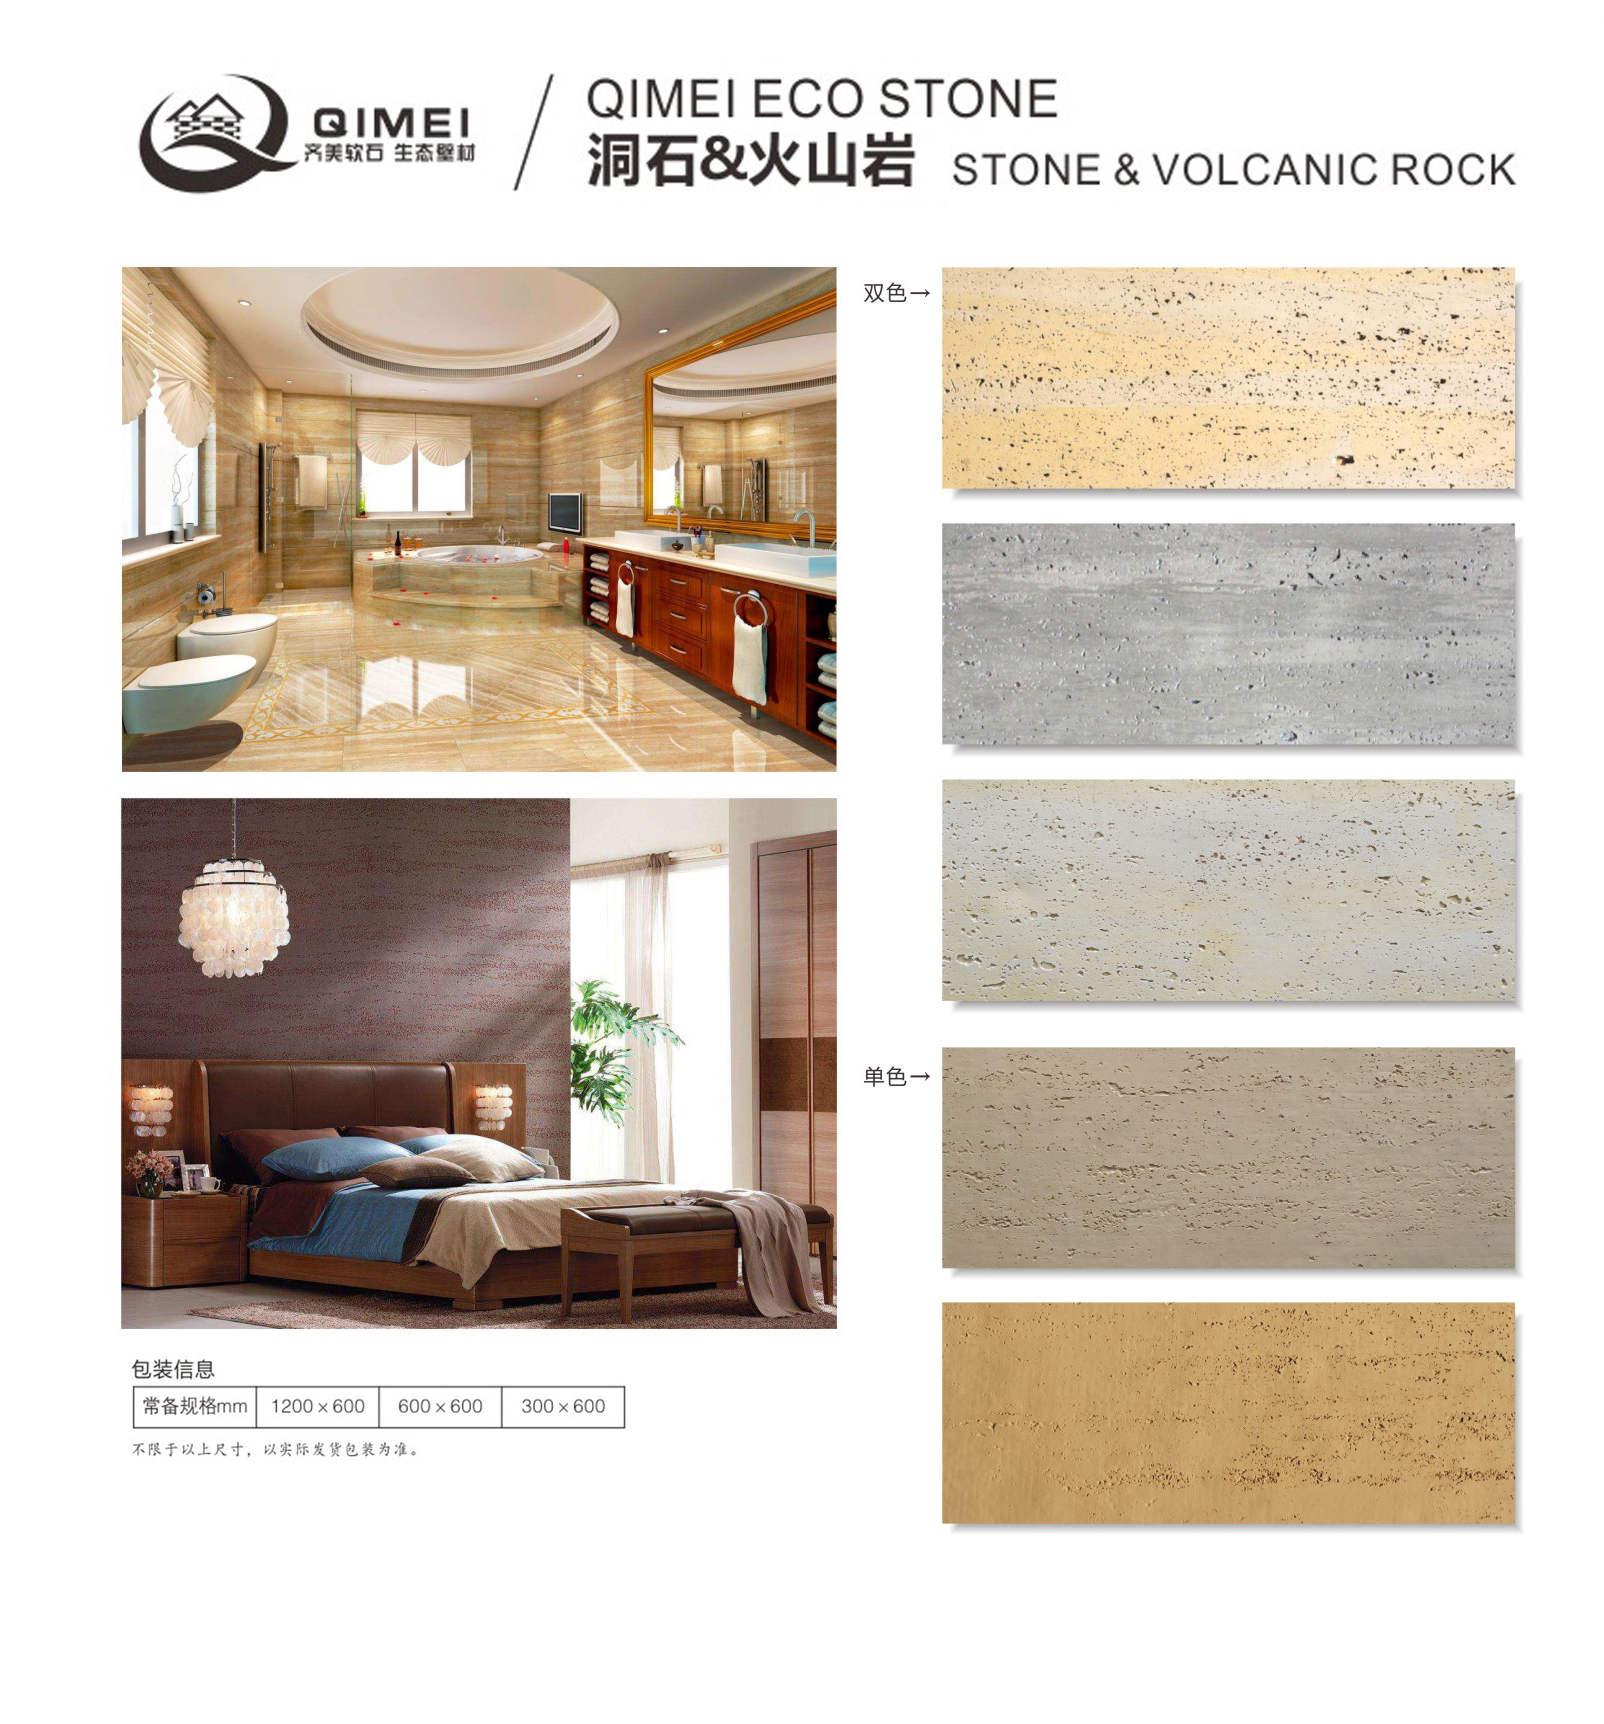 hole stone pattern customized and personalized soft stone/brick/tile/ceremics